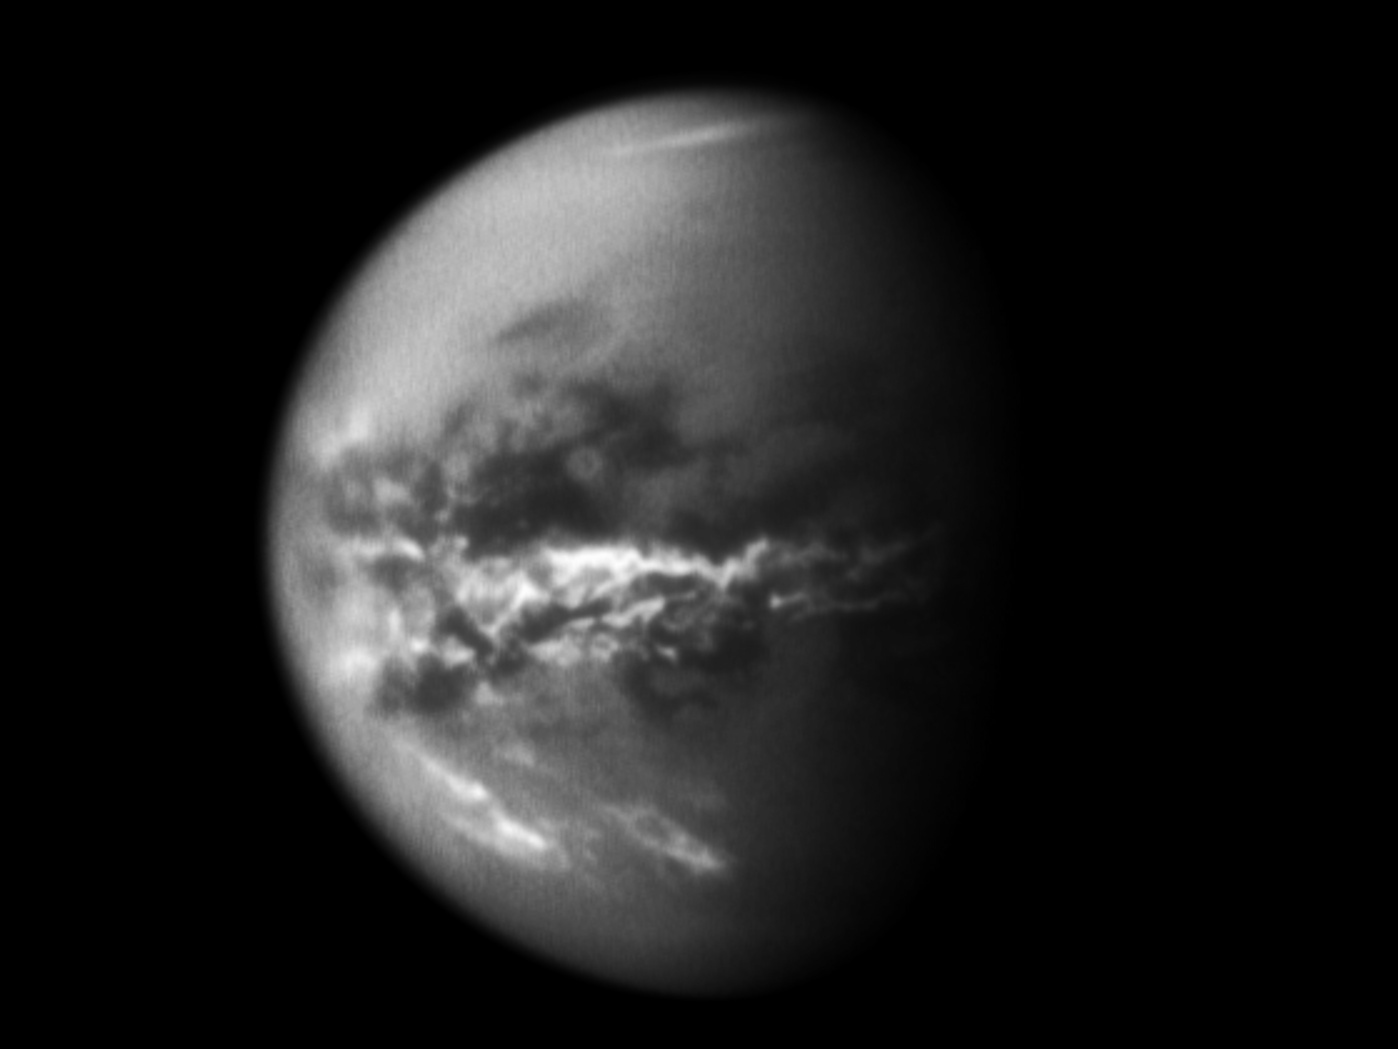 Clouds near Titan's equator. Image credit: NASA/JPL/SSI